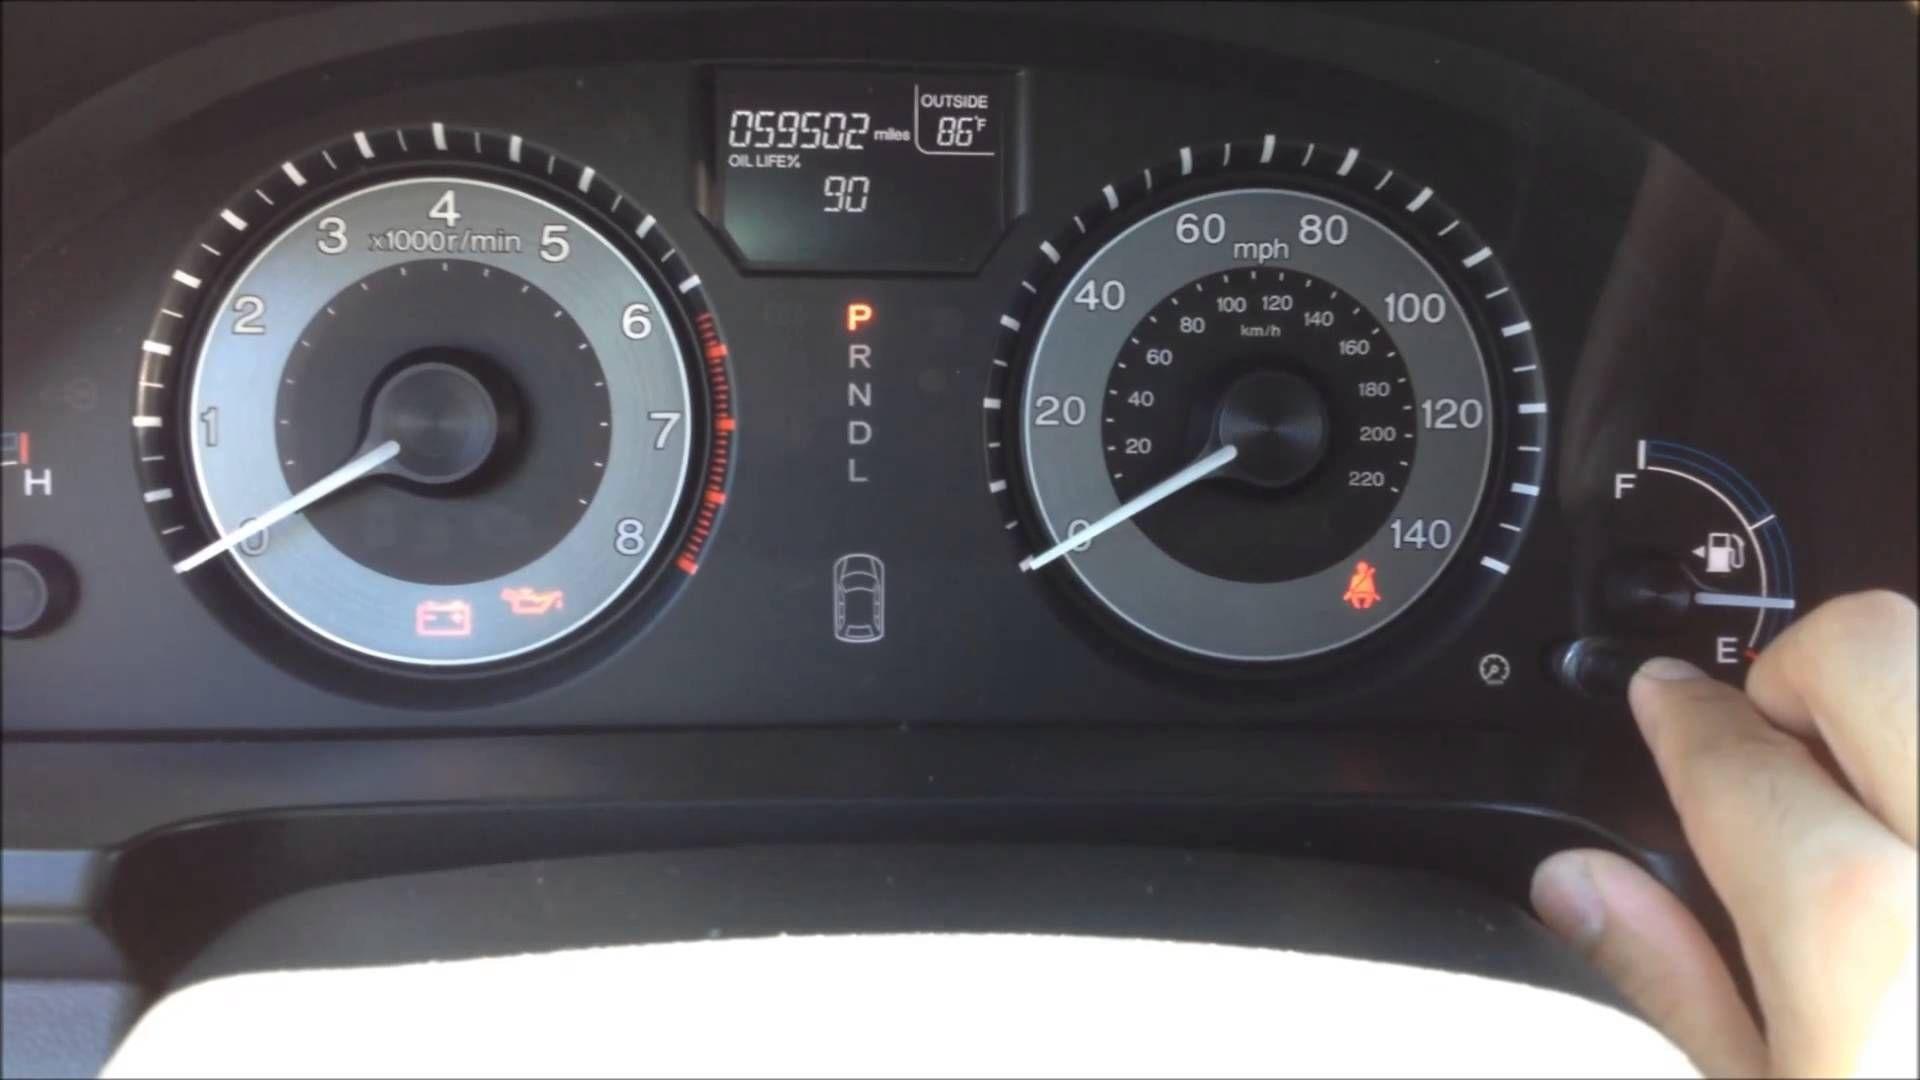 Reset Oil Maintenance Light - 2010 to 2013 Honda Odyssey